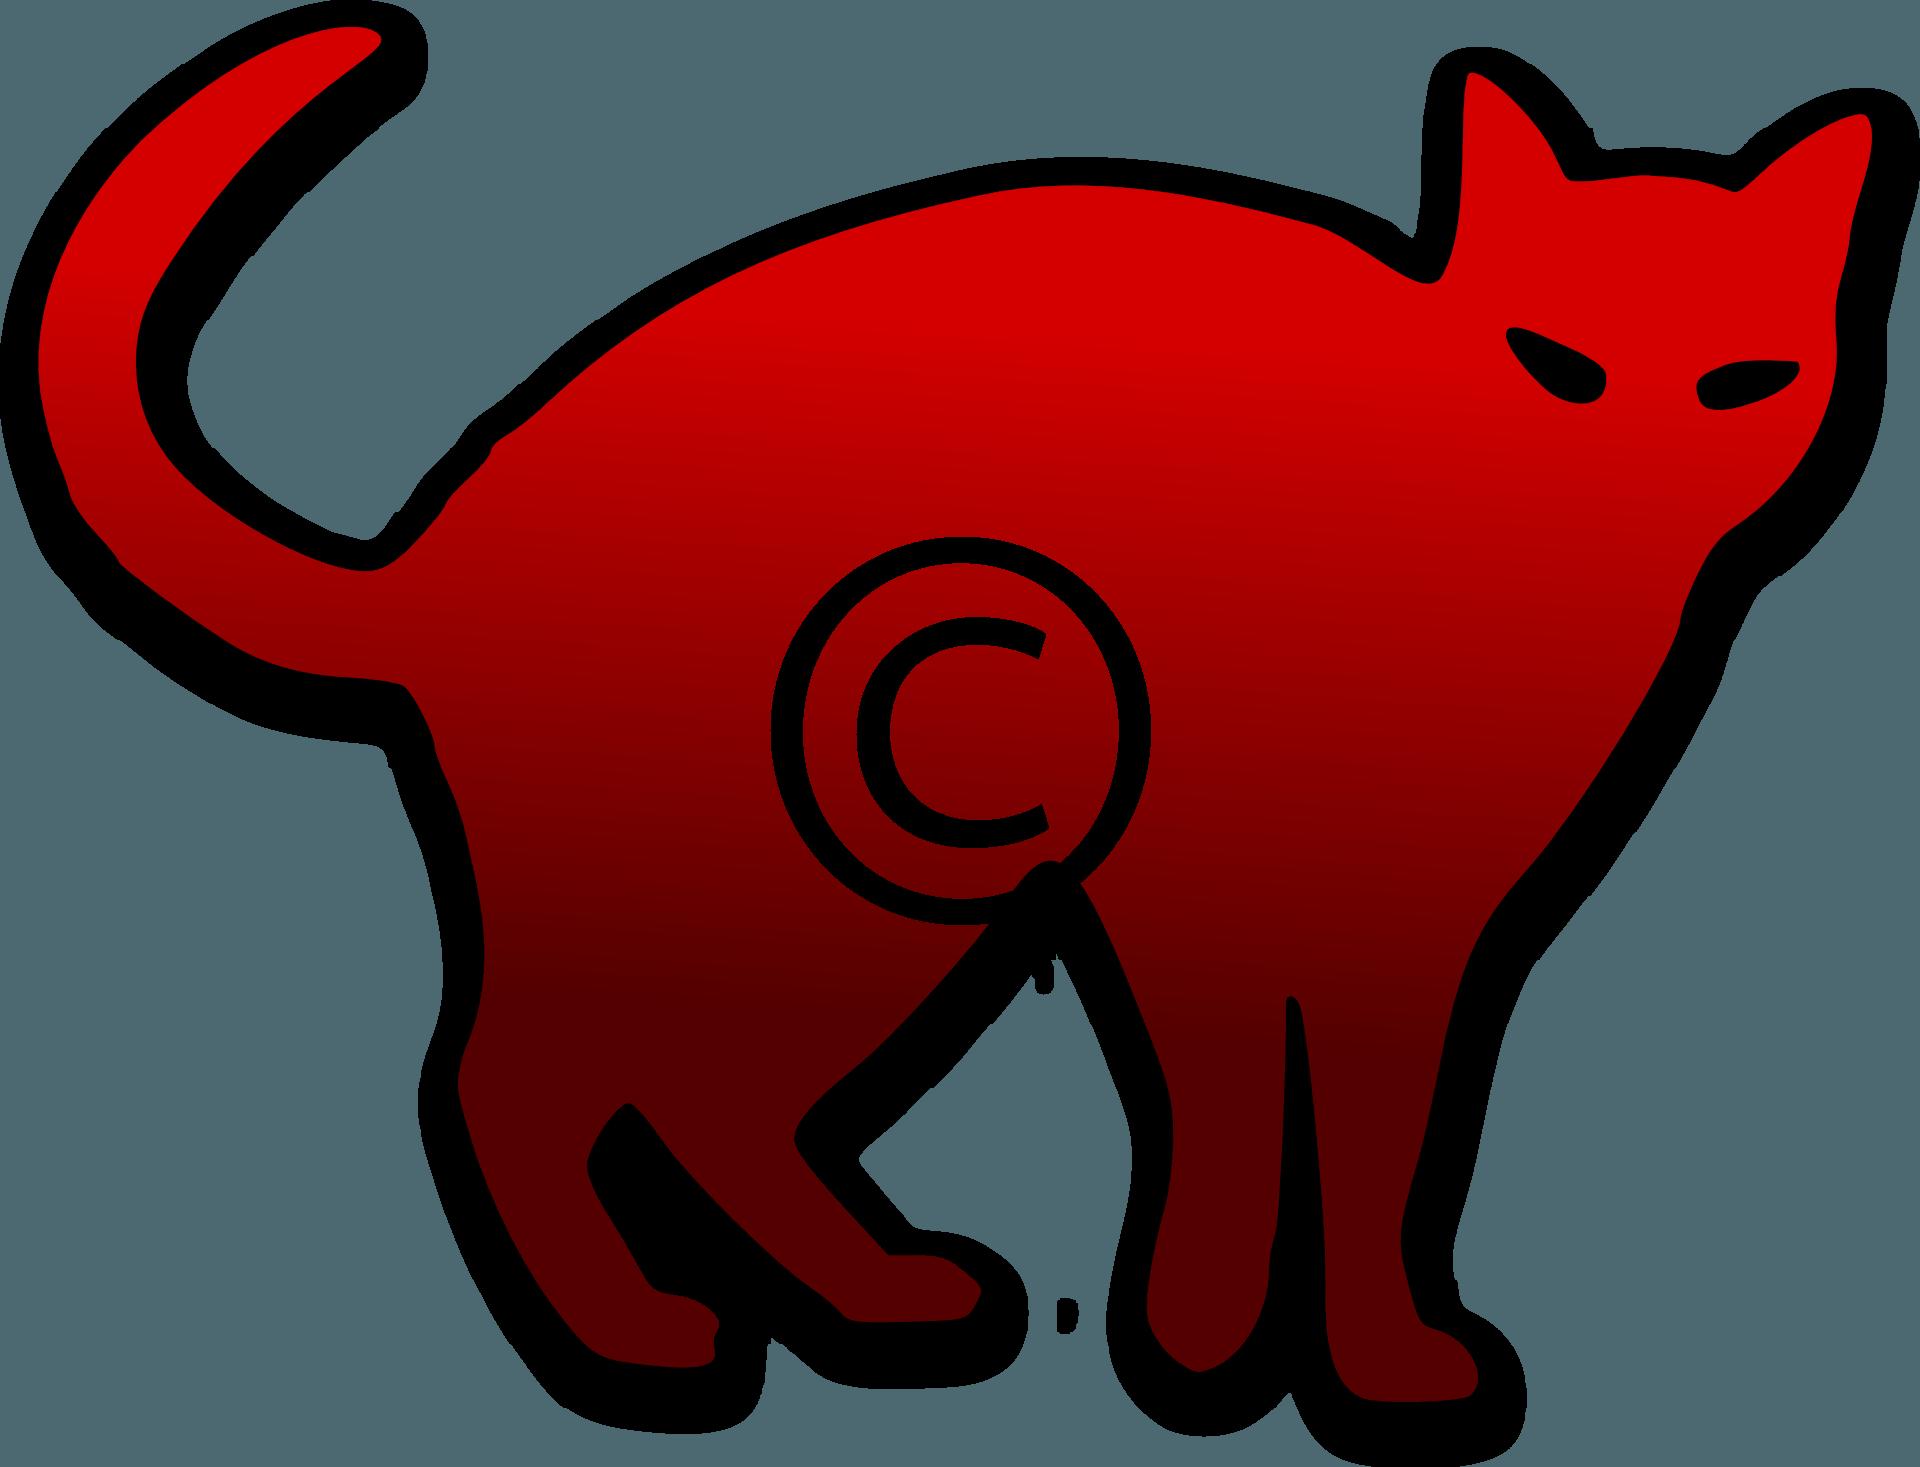 Scarecrow - Png - Gato Negro Para Dibujar (1920x1467), Png Download